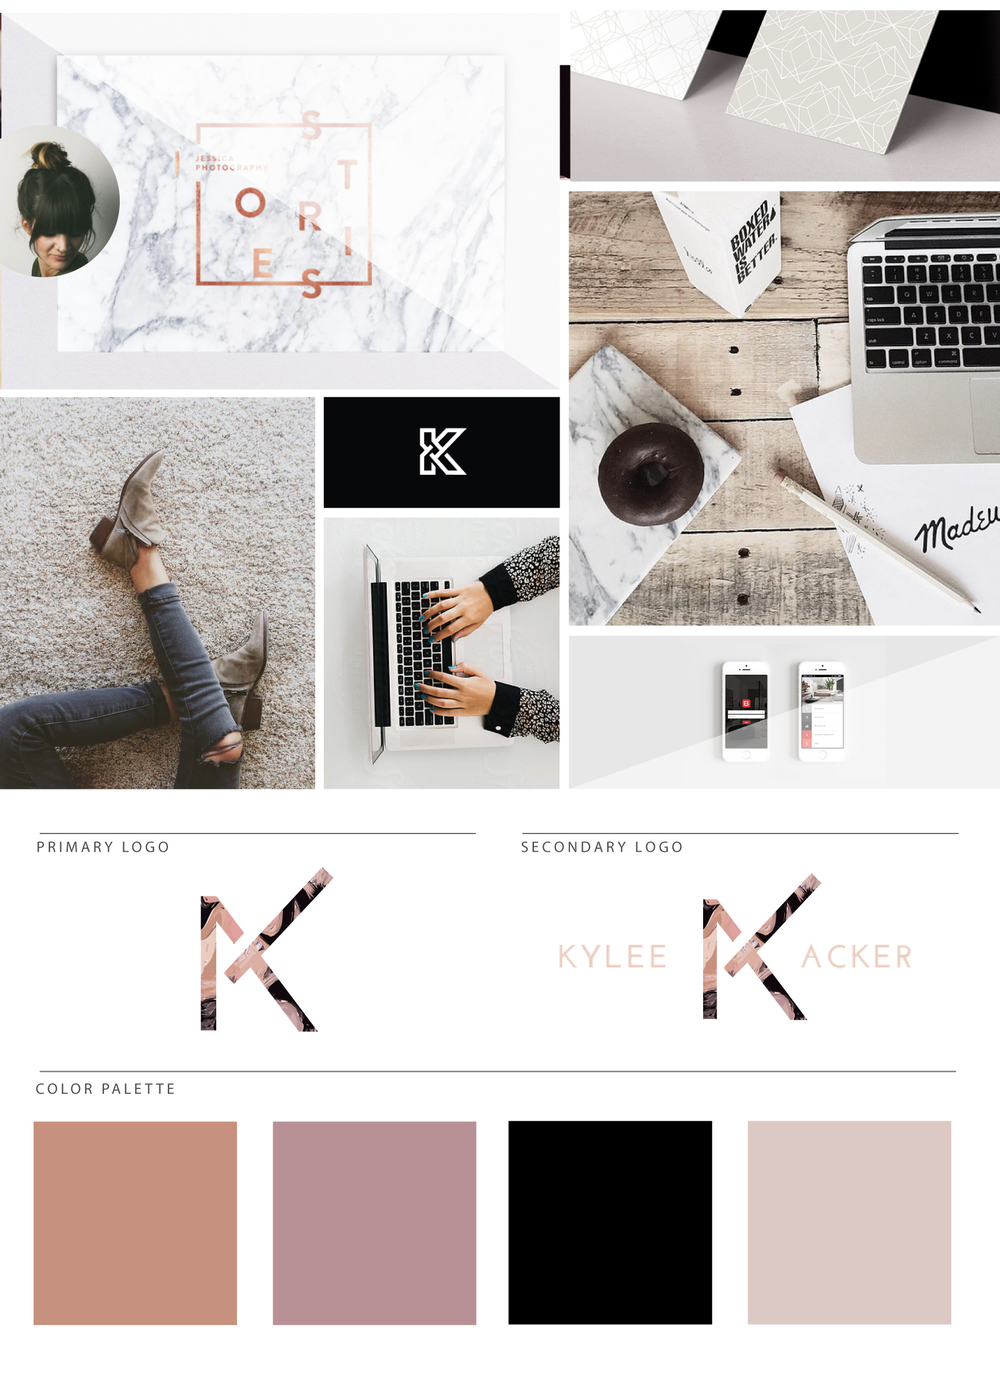 Kylee-Acker-Portfolio-Board-Moodboard-04.jpg